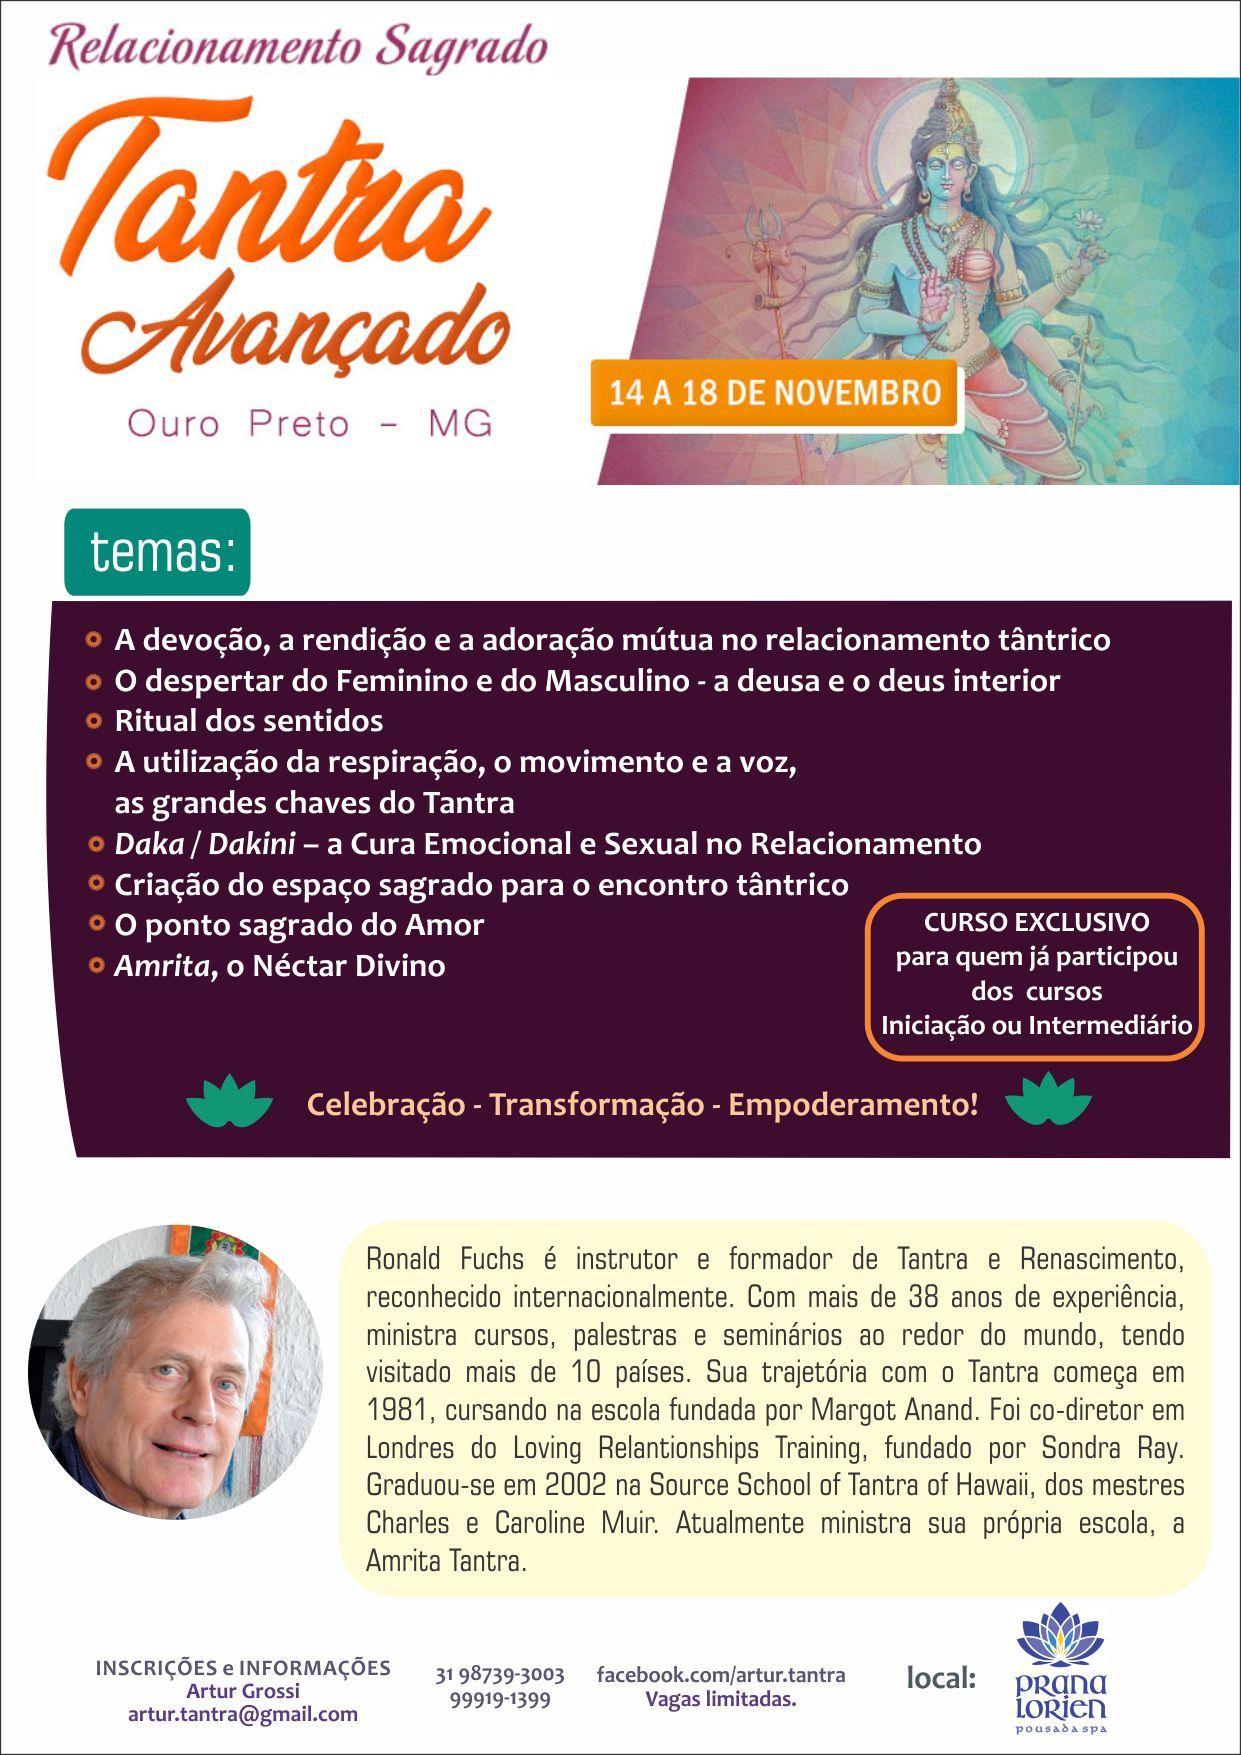 Tantra Avançado 14 a 18 de Novembro Belo Horizonte (Brasil)